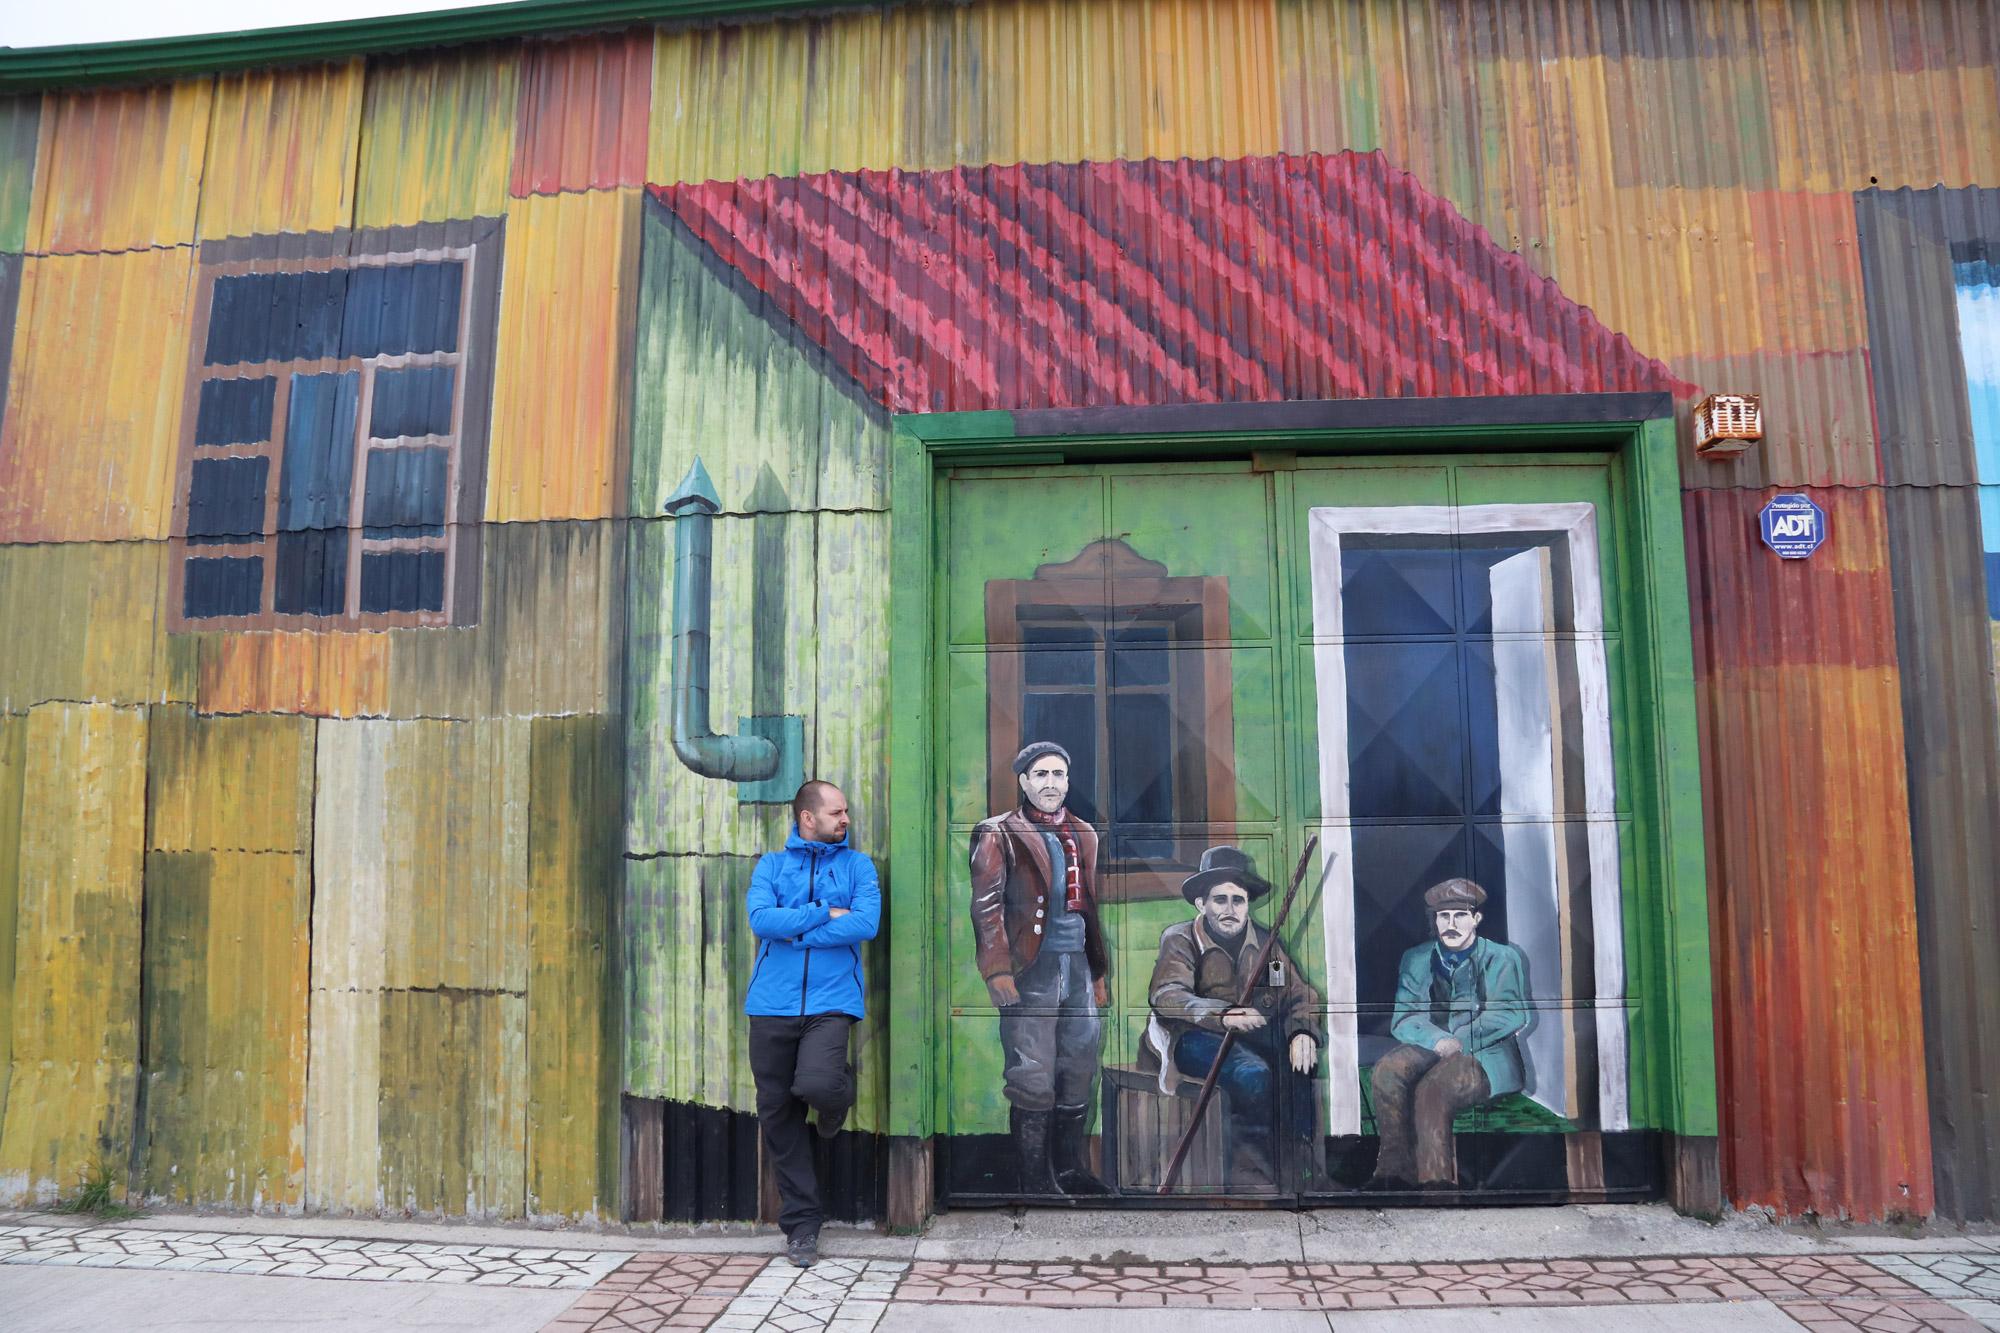 Patagonië - Punta Arenas - Graffiti